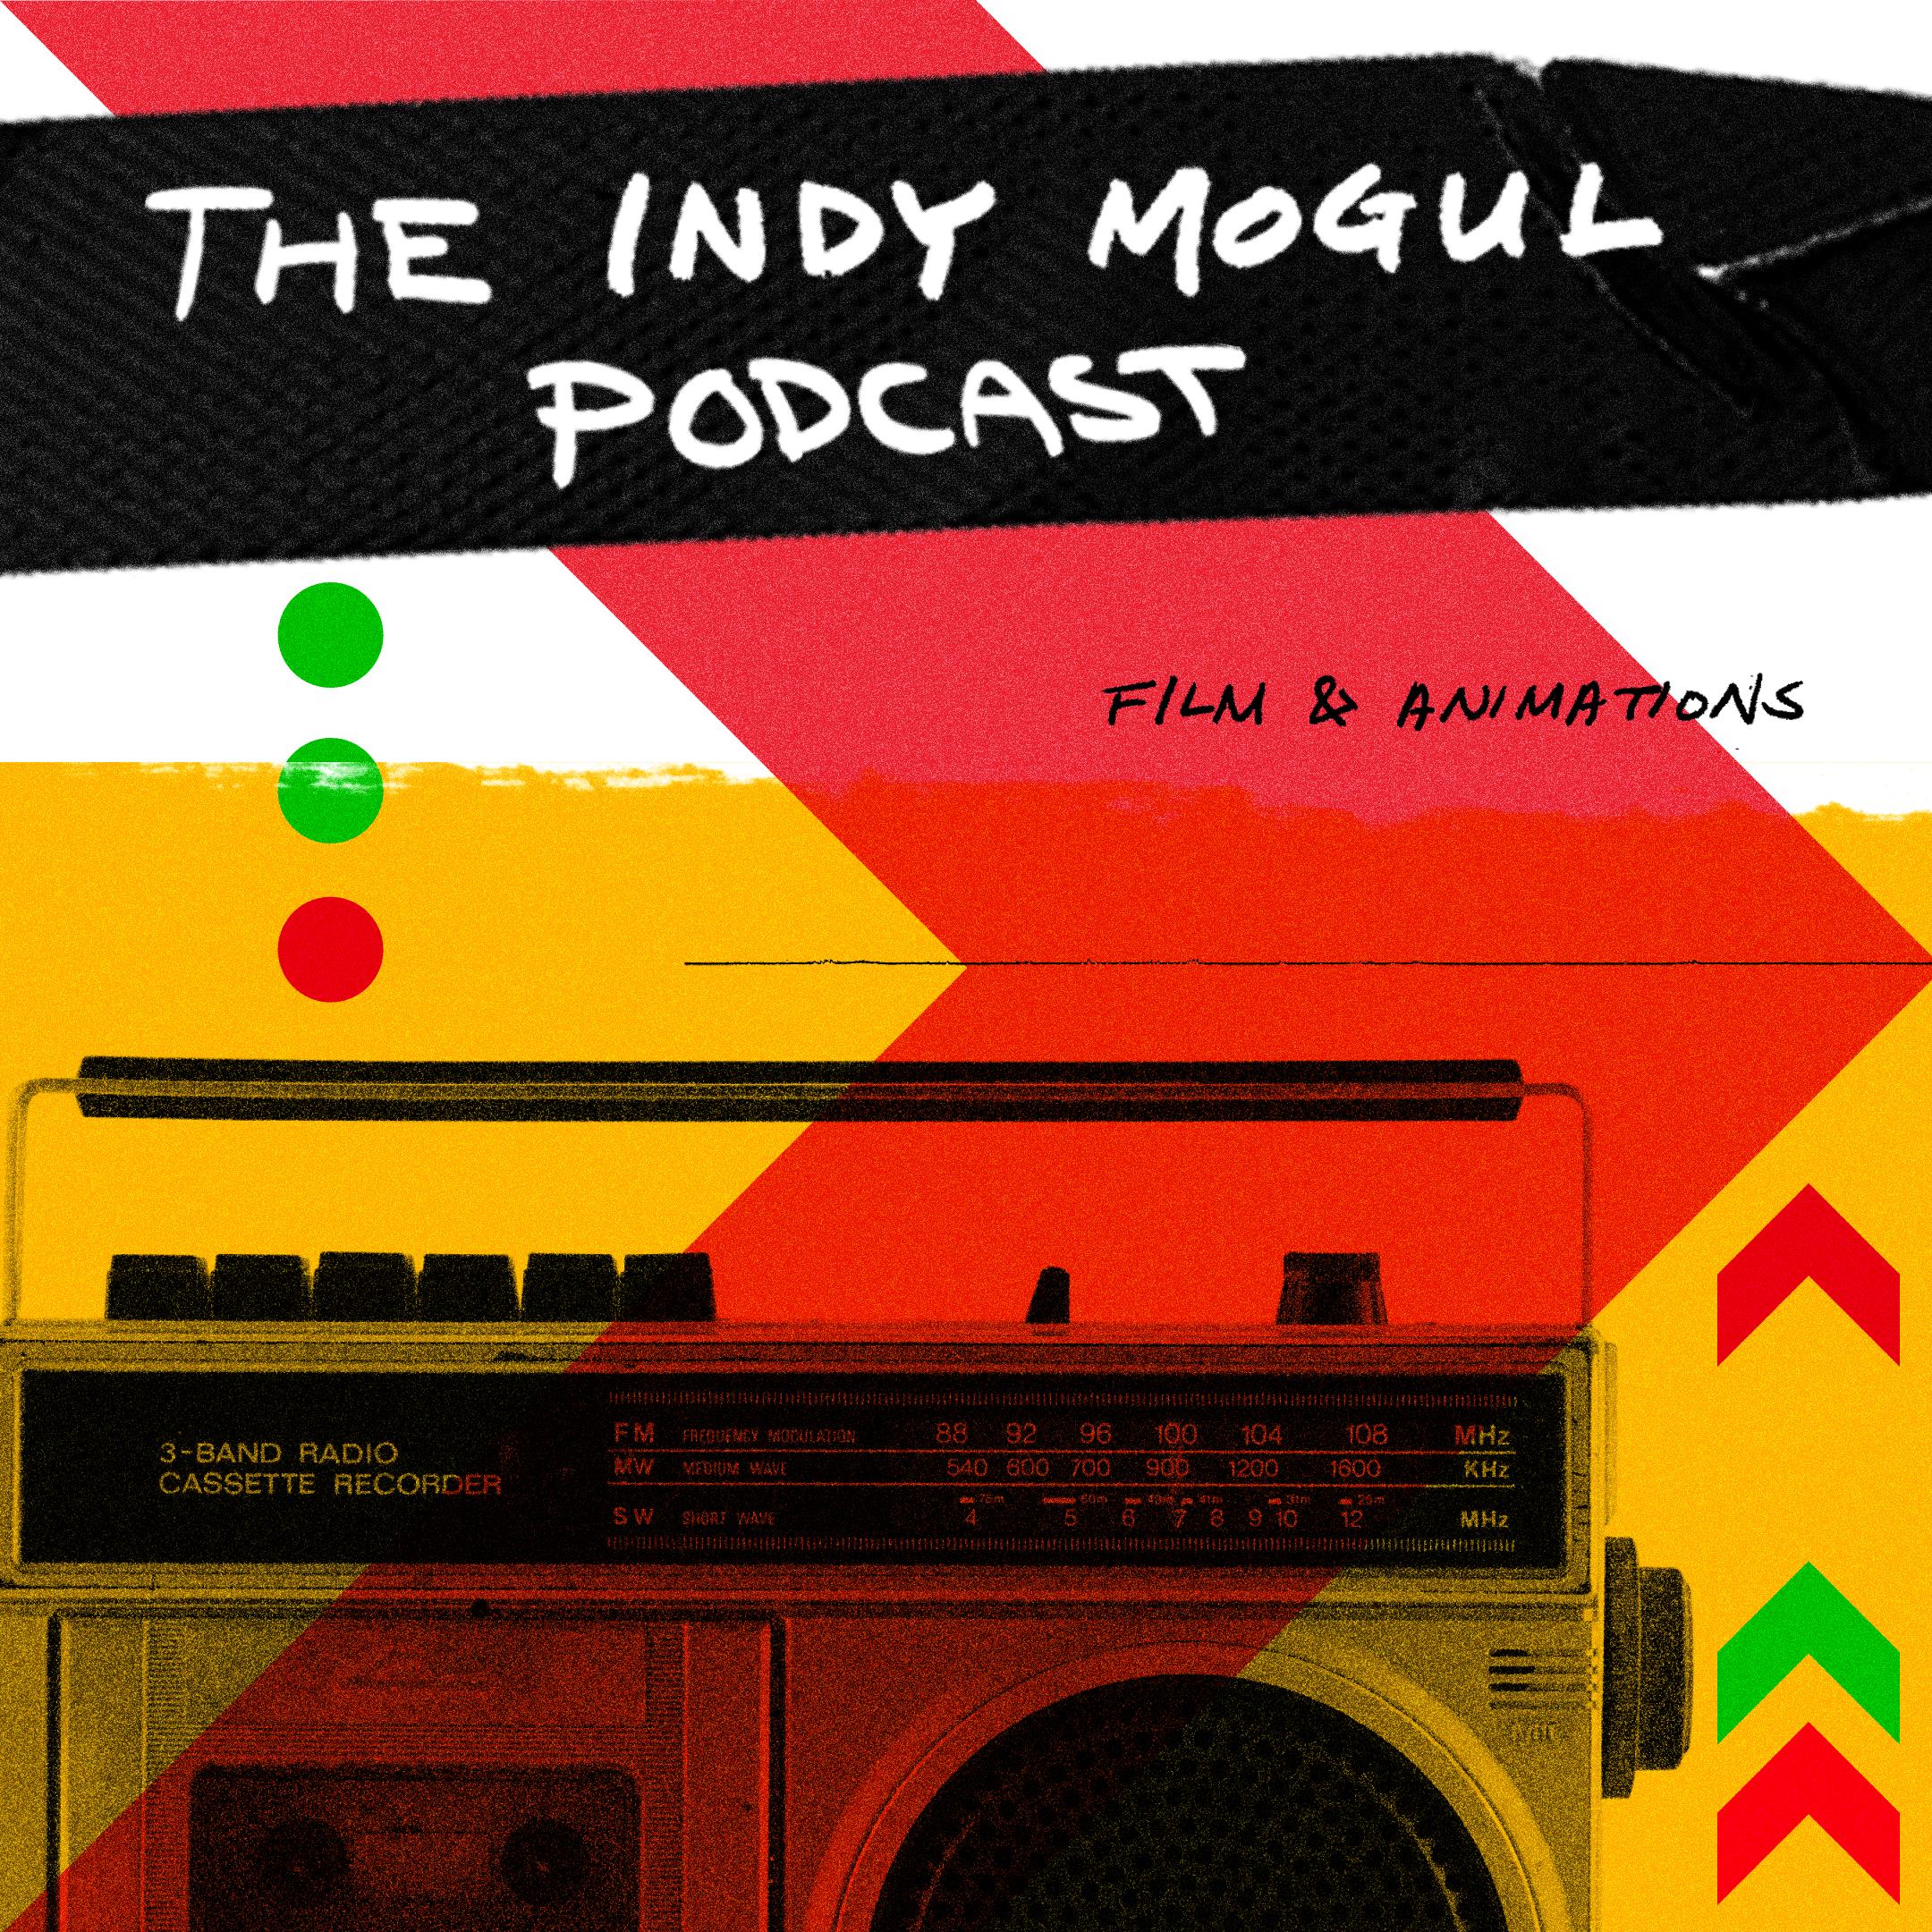 The Indy Mogul Podcast | Listen via Stitcher for Podcasts